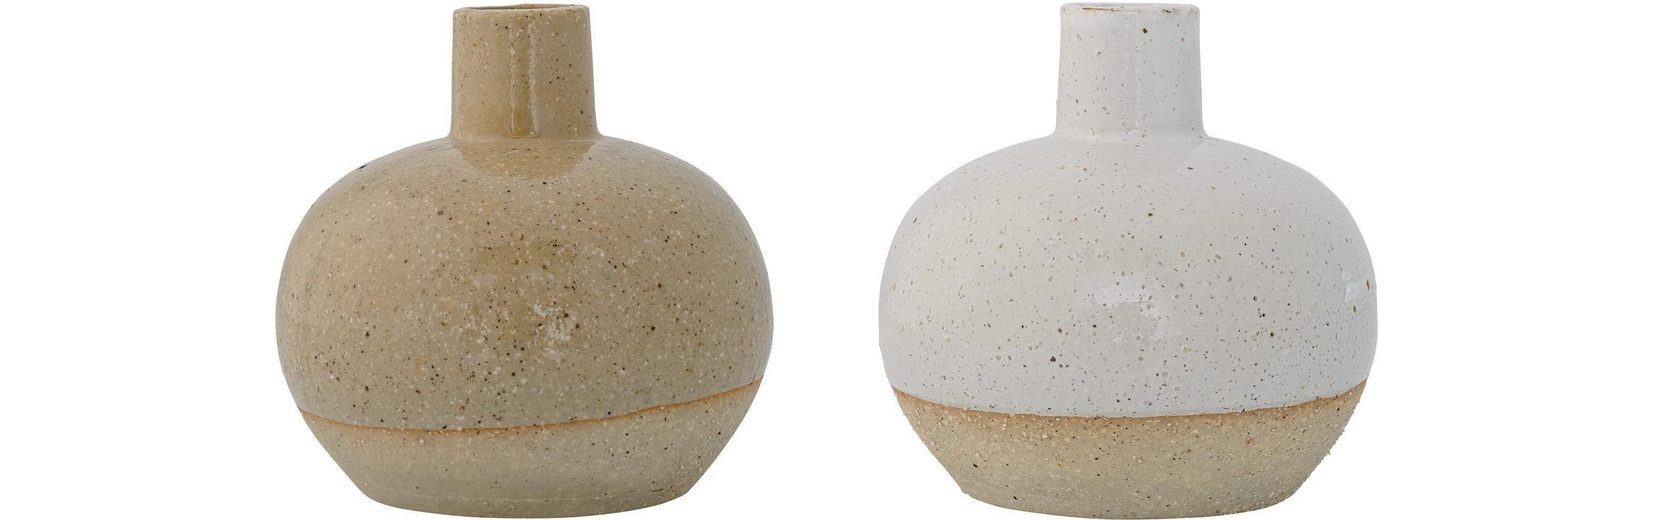 Bloomingville Vase »Barbara« (2-tlg.)